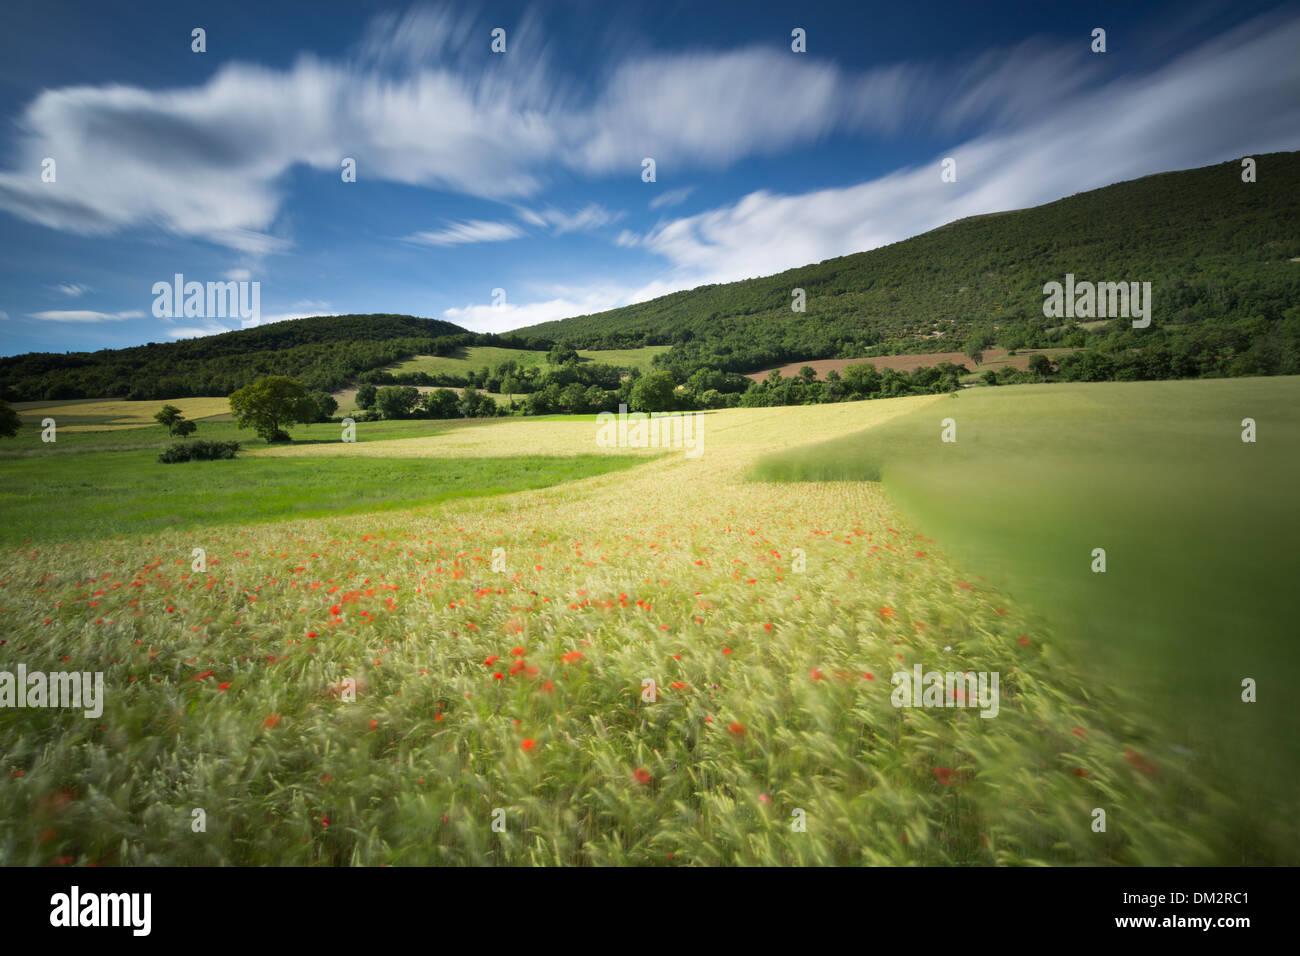 poppies, in barley field near Campi, Umbria, Italy - Stock Image